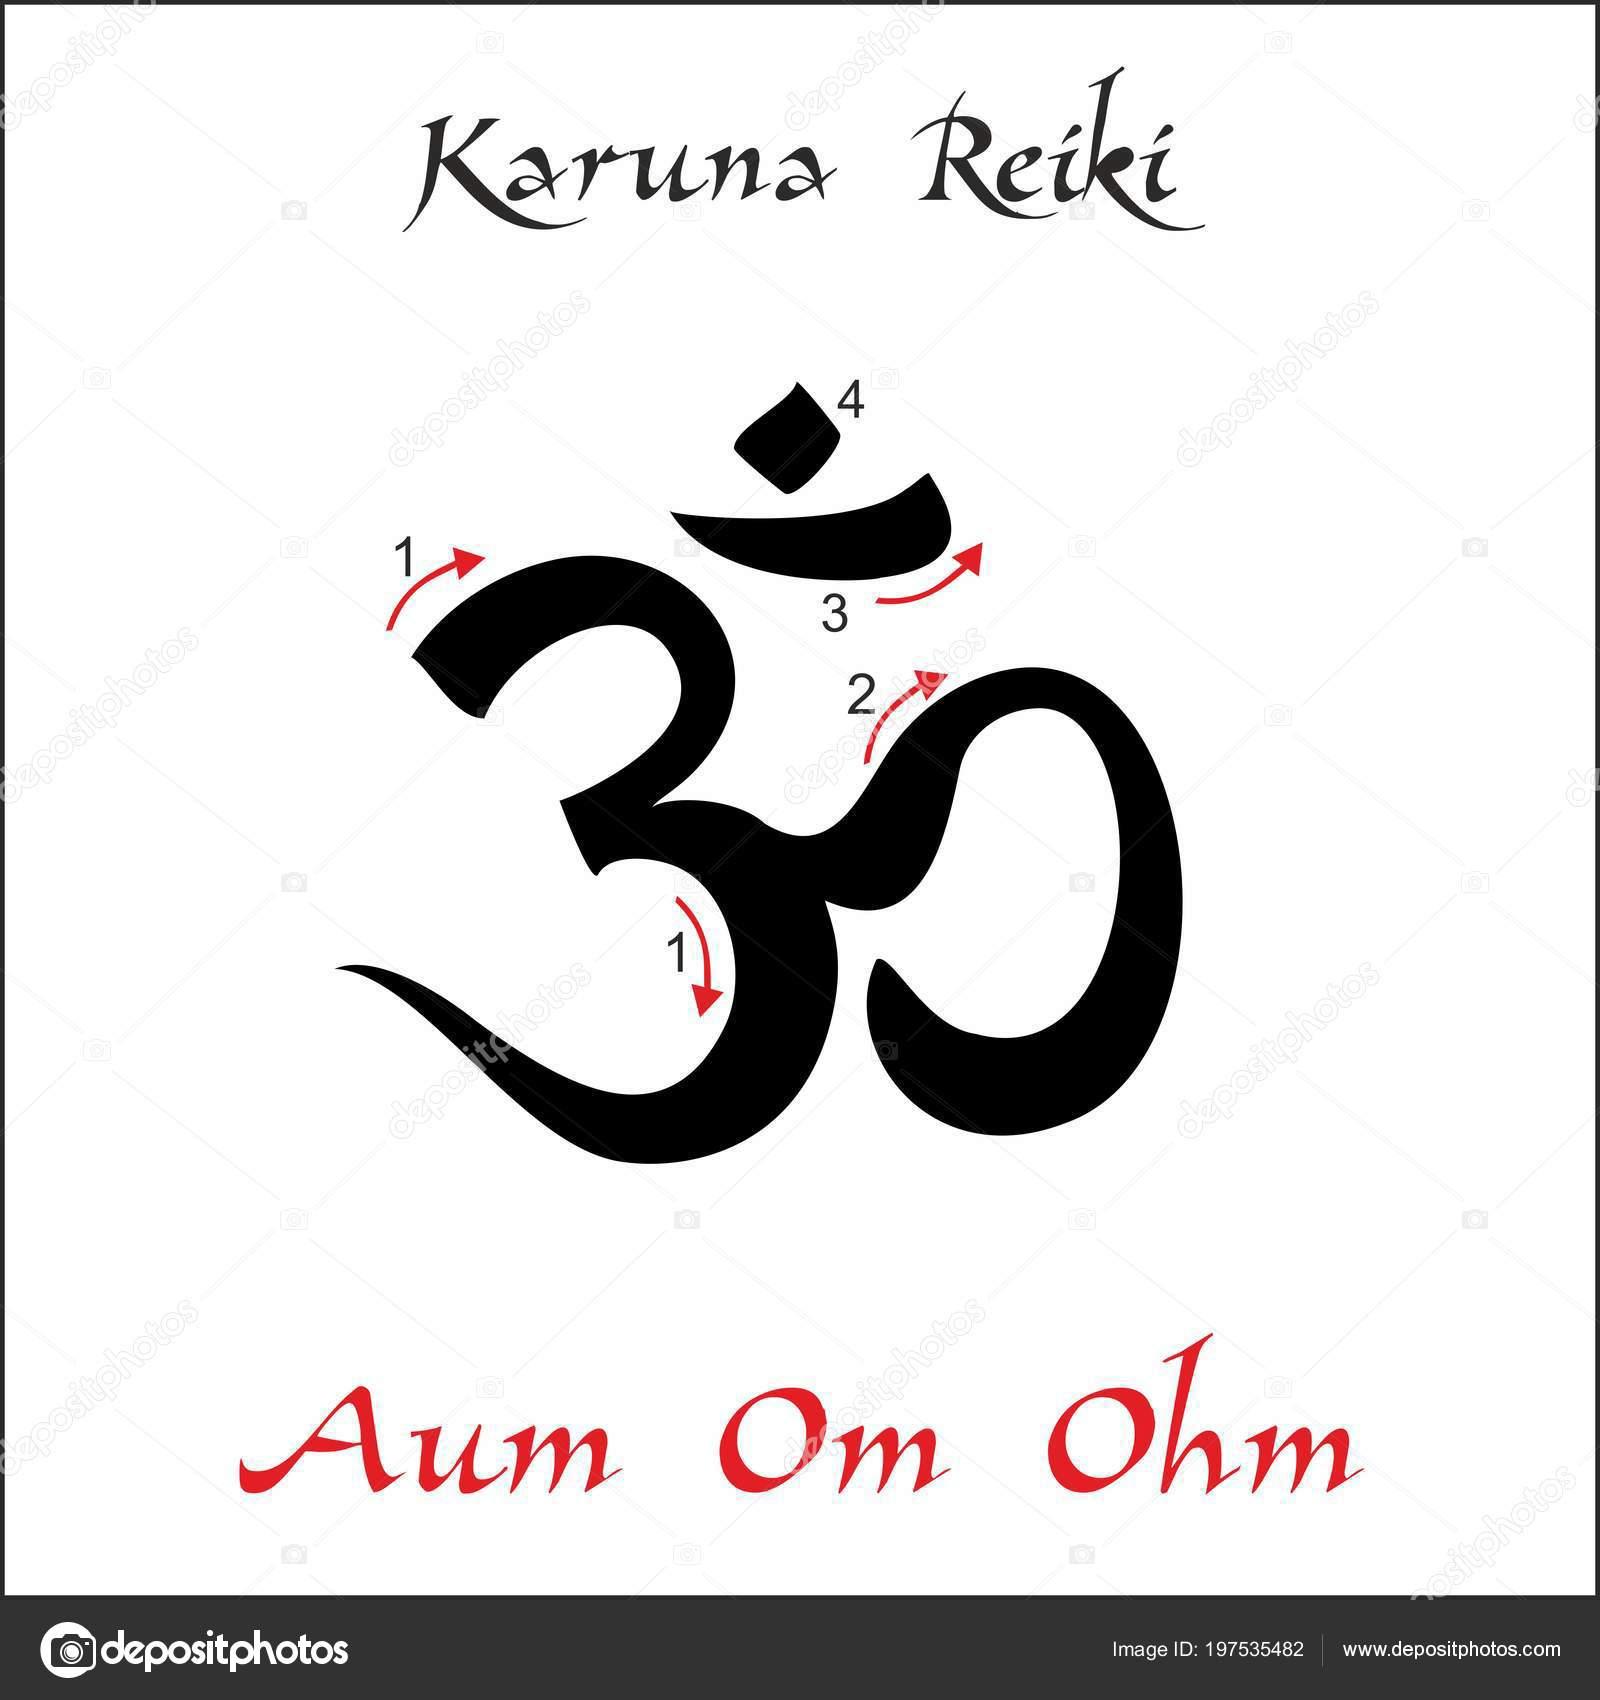 Karuna Reiki. Energy healing. Alternative medicine. Om Aum Ohm Symbol. Spiritual practice. Esoteric. Vector